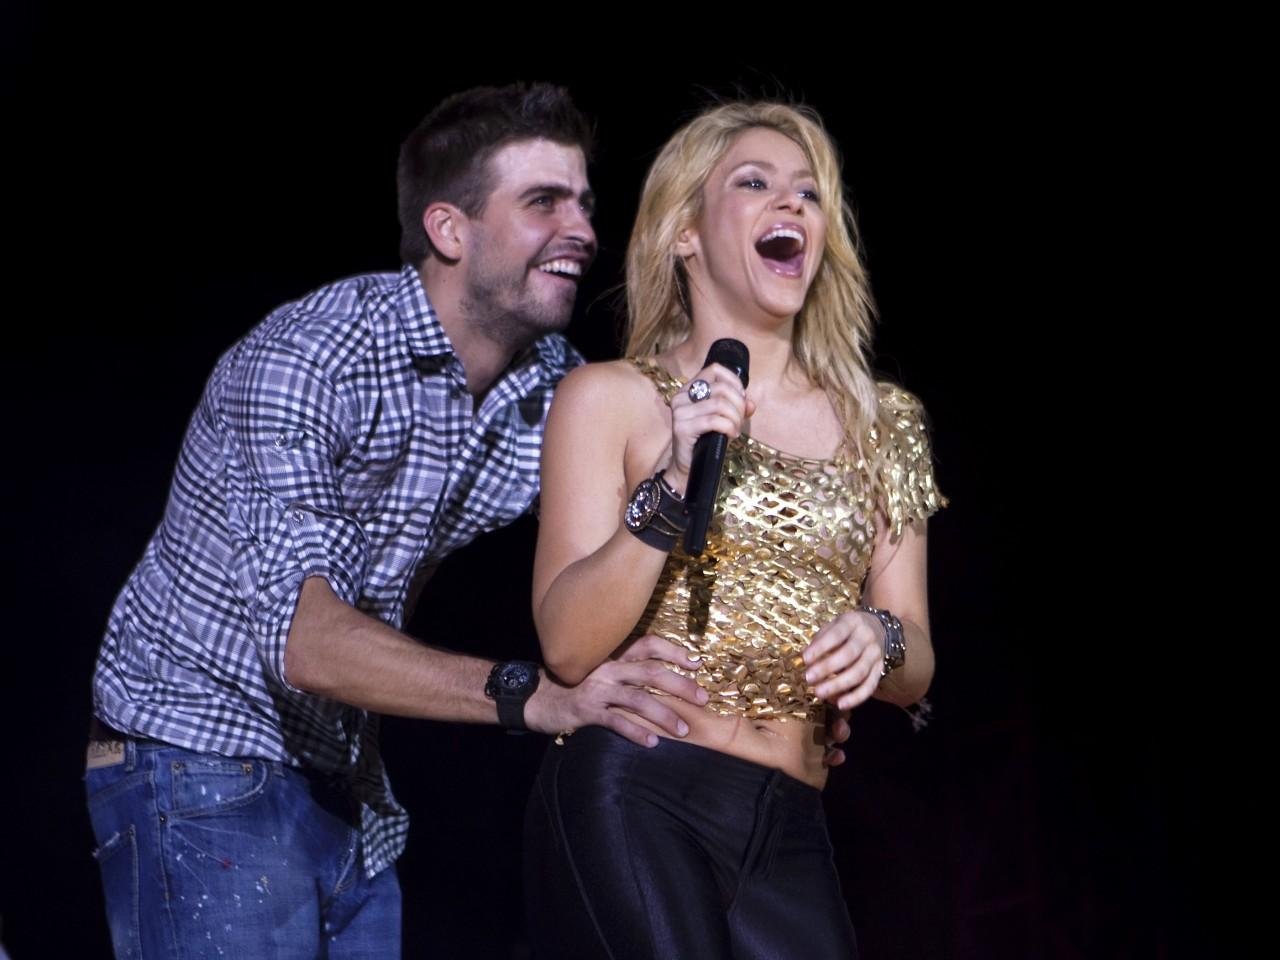 Shakira's Baby Photo: Husband Gerard Teases Photo of Son Milan